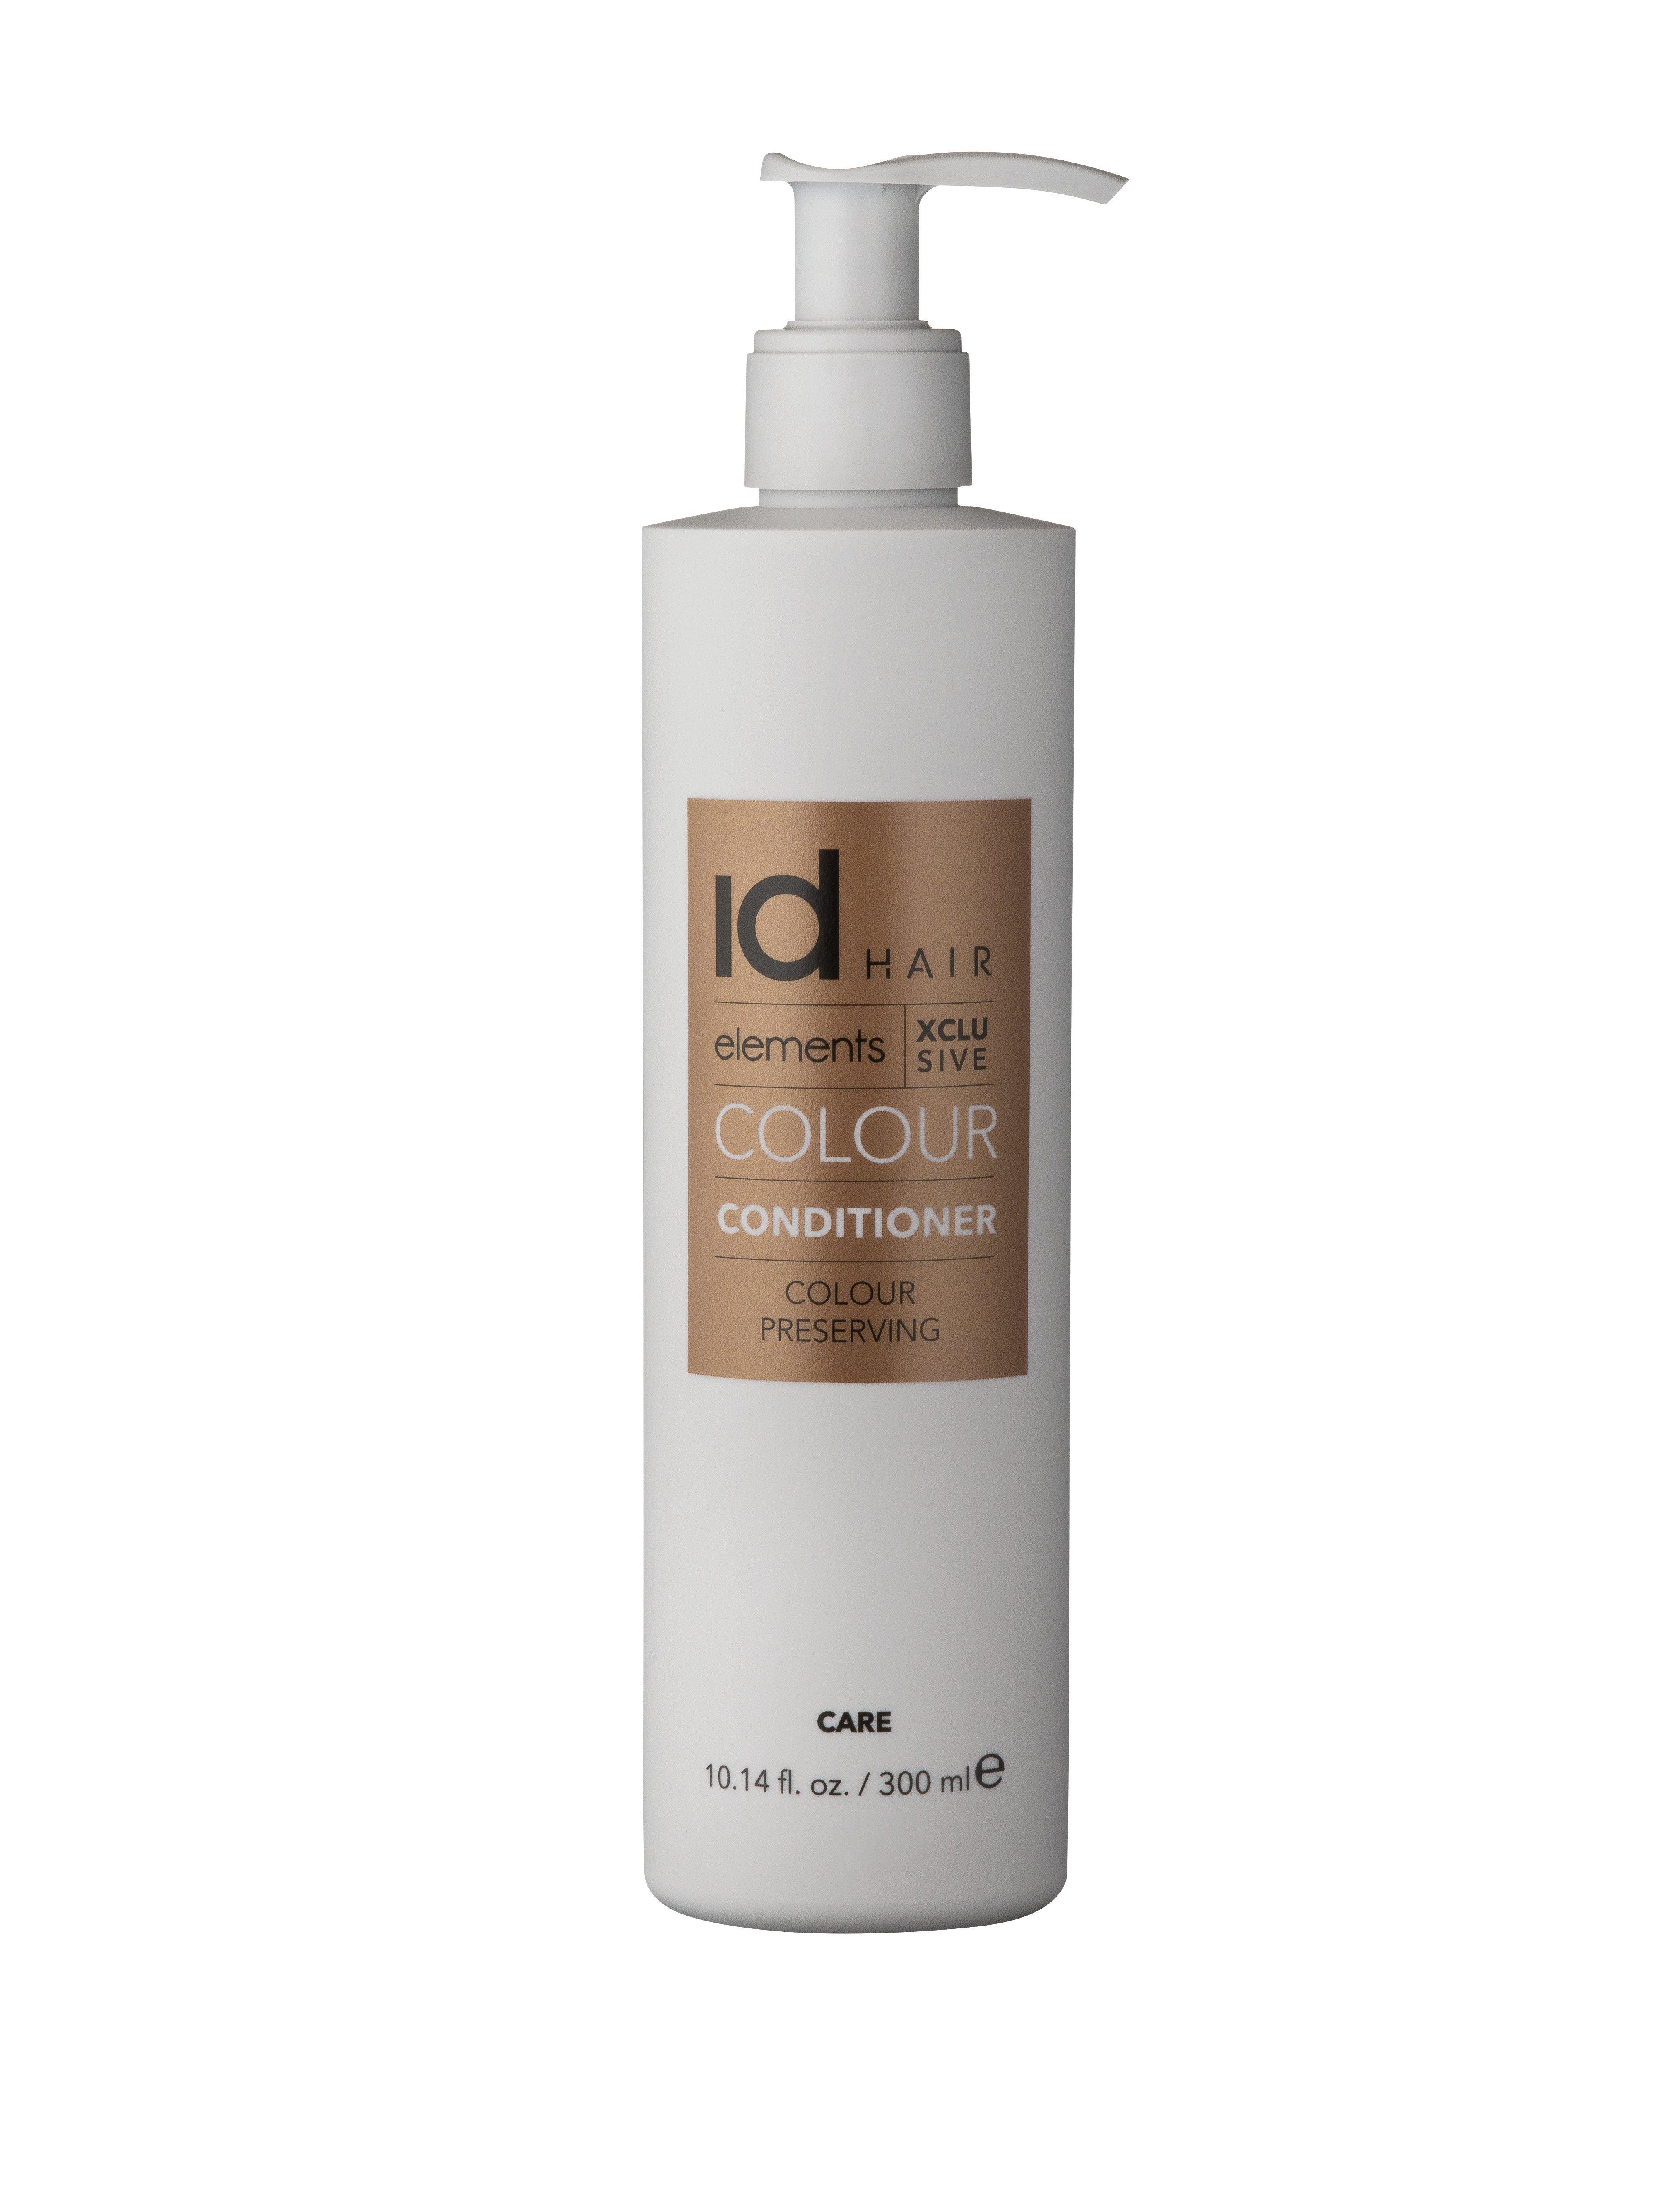 IdHAIR - Elements Xclusive Colour Conditioner 300 ml